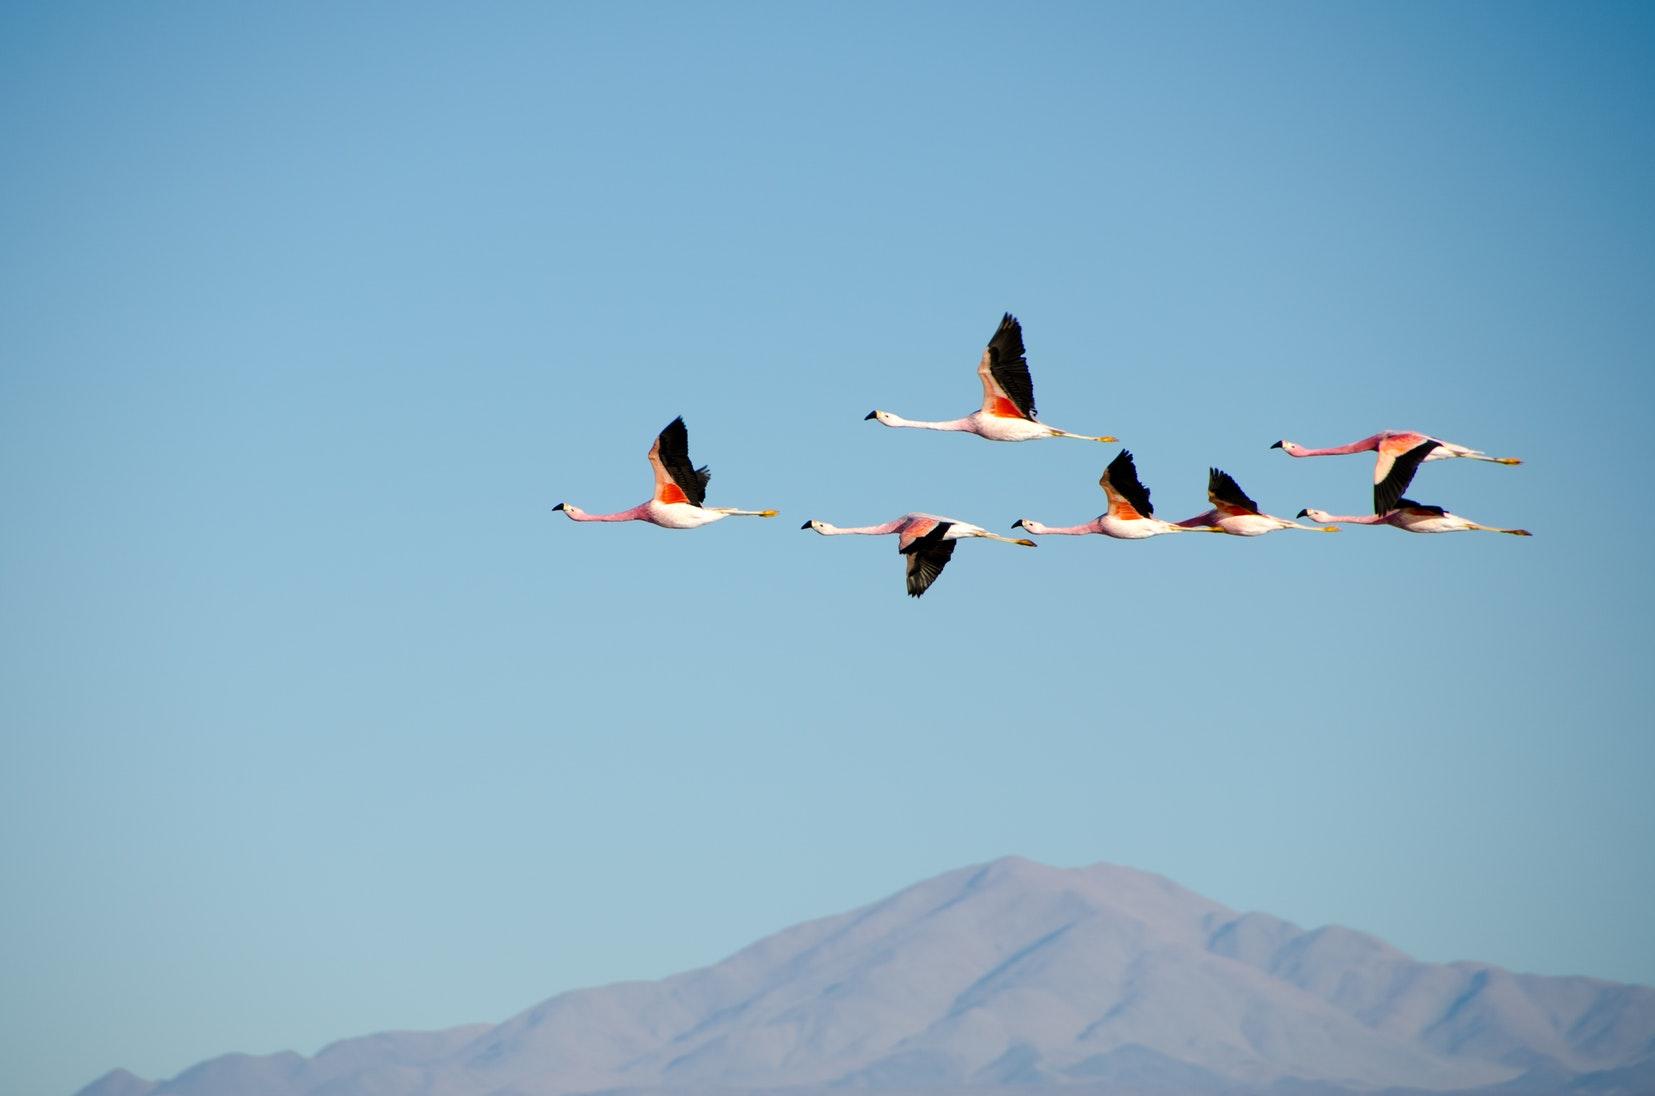 Carnet de voyage : d'Atacama à Uyuni